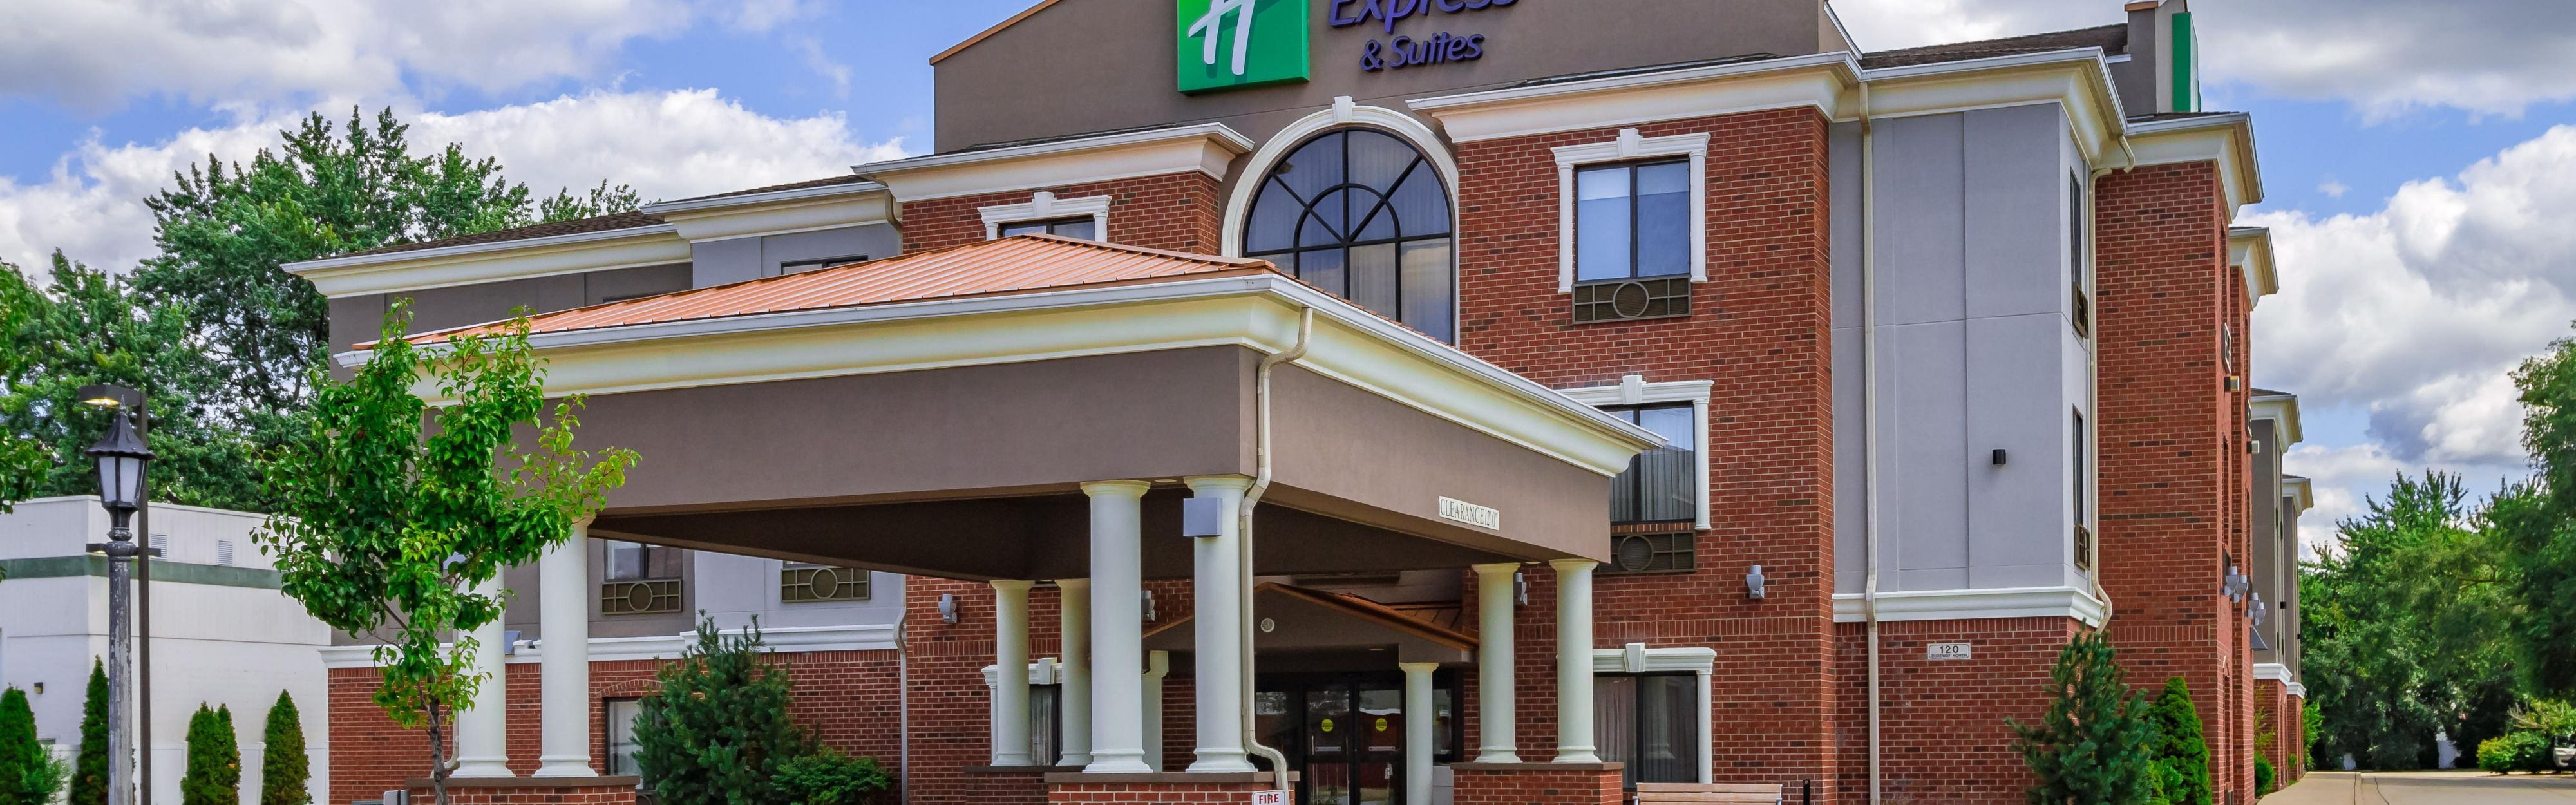 Holiday Inn Express & Suites South Bend - Notre Dame Univ. image 0